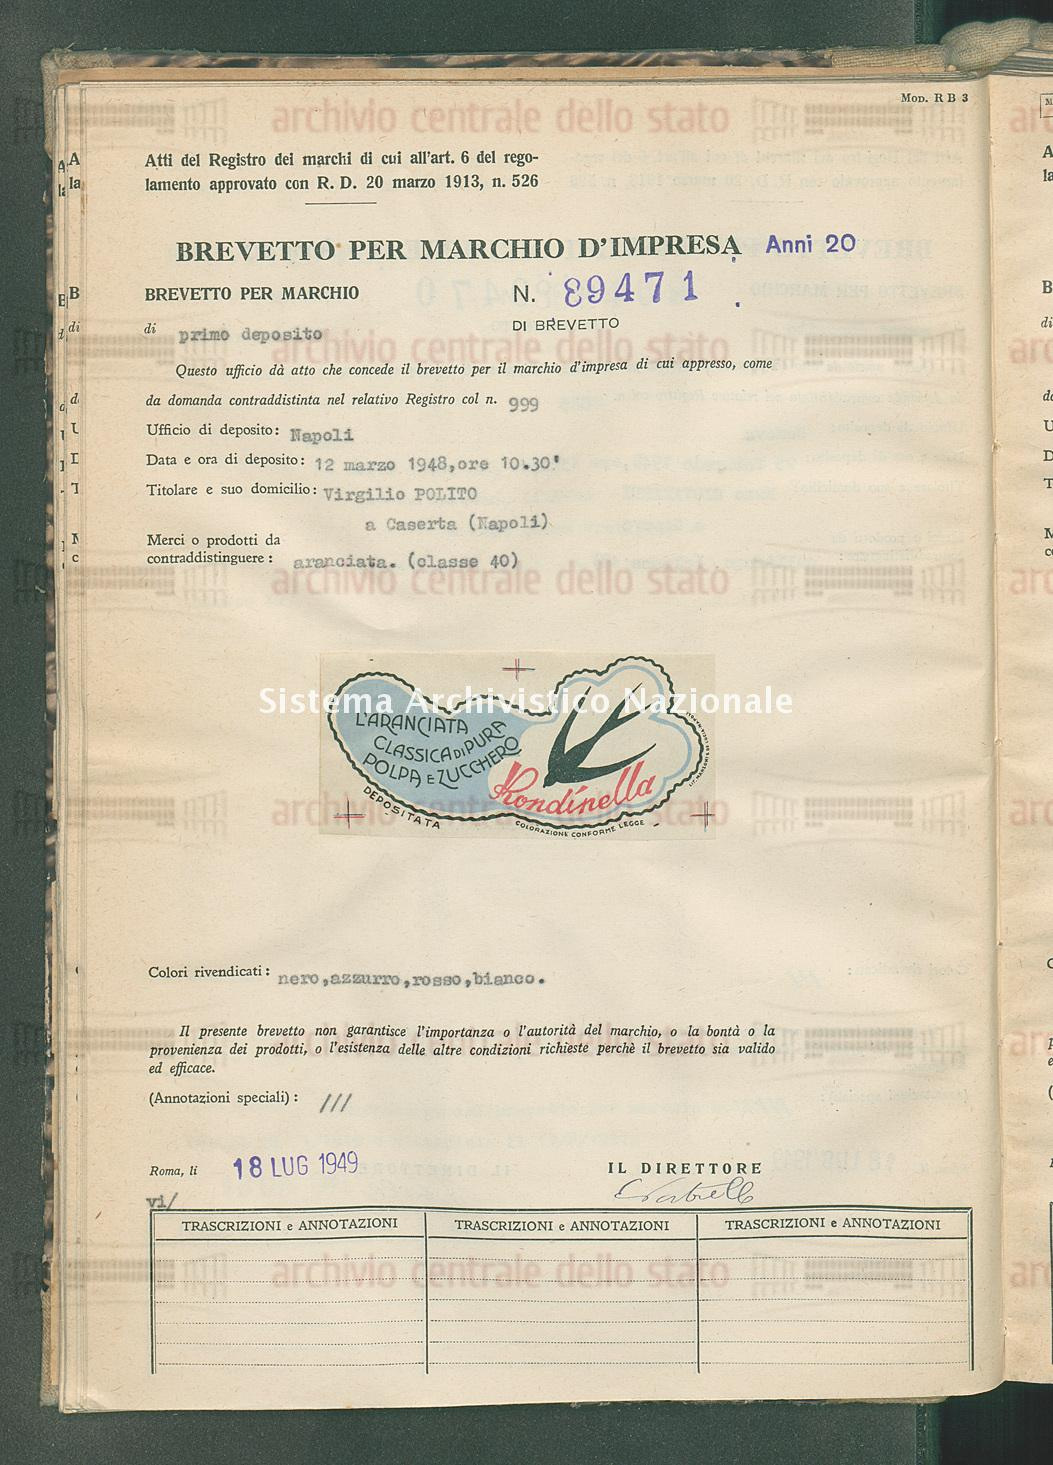 Aranciata. Virgilio Polito (18/07/1949)